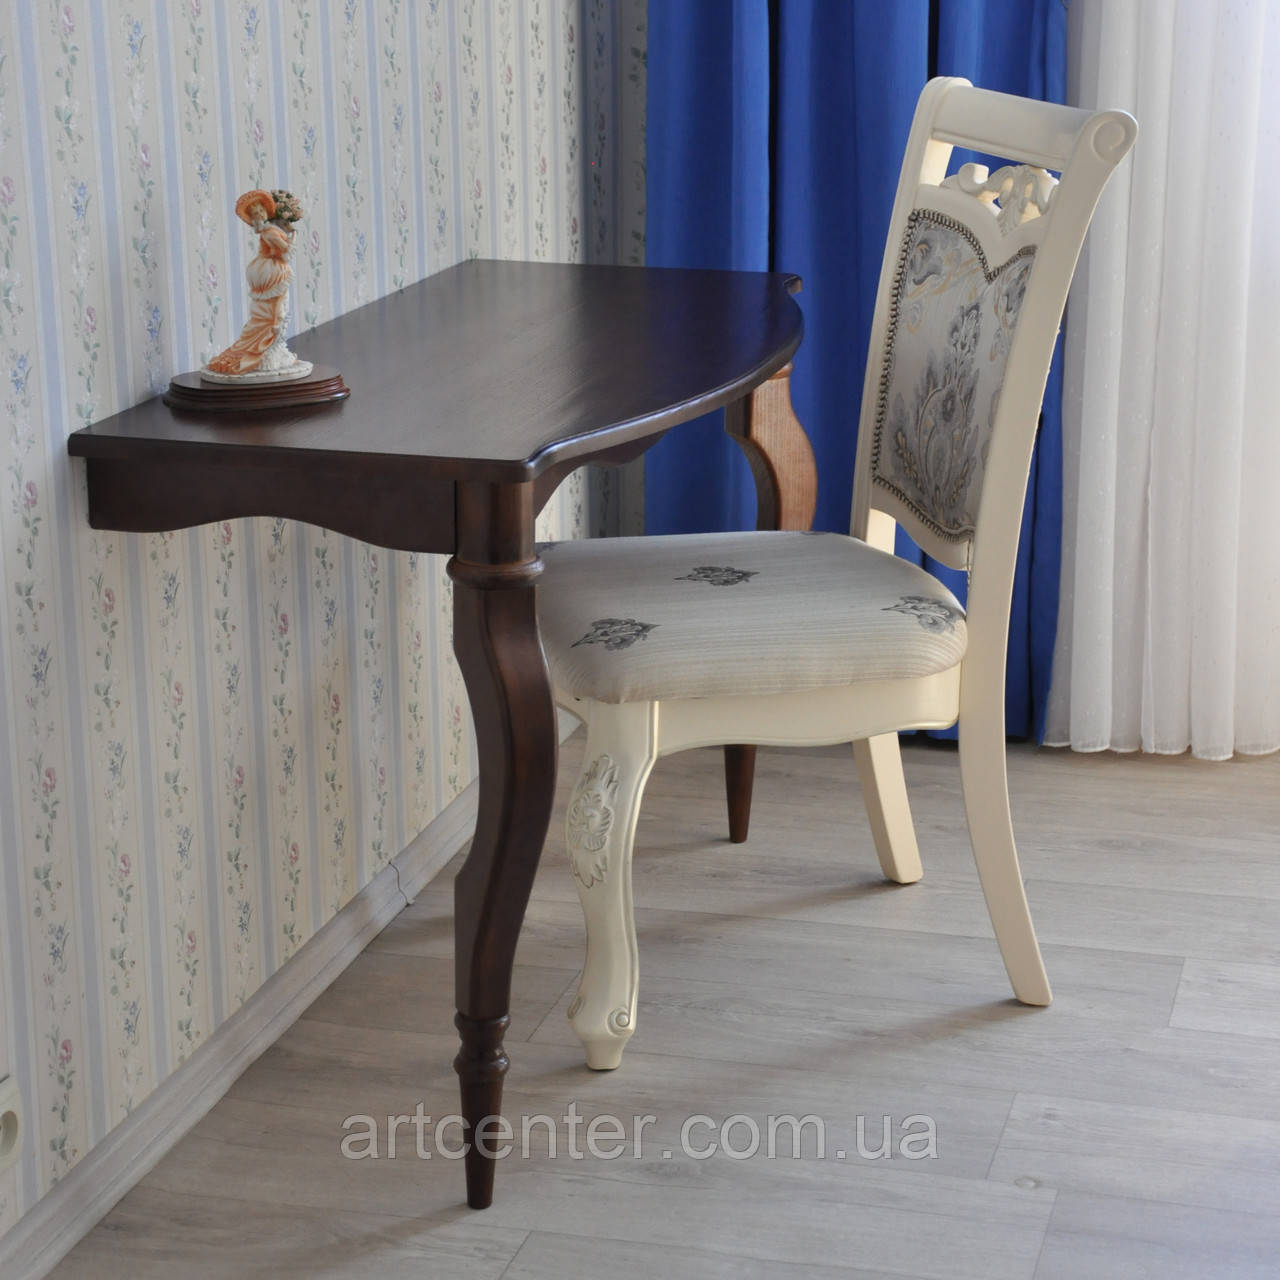 "Приставний столик на точених ніжках, консоль ""Прованс"", коричневий, туалетний столик"